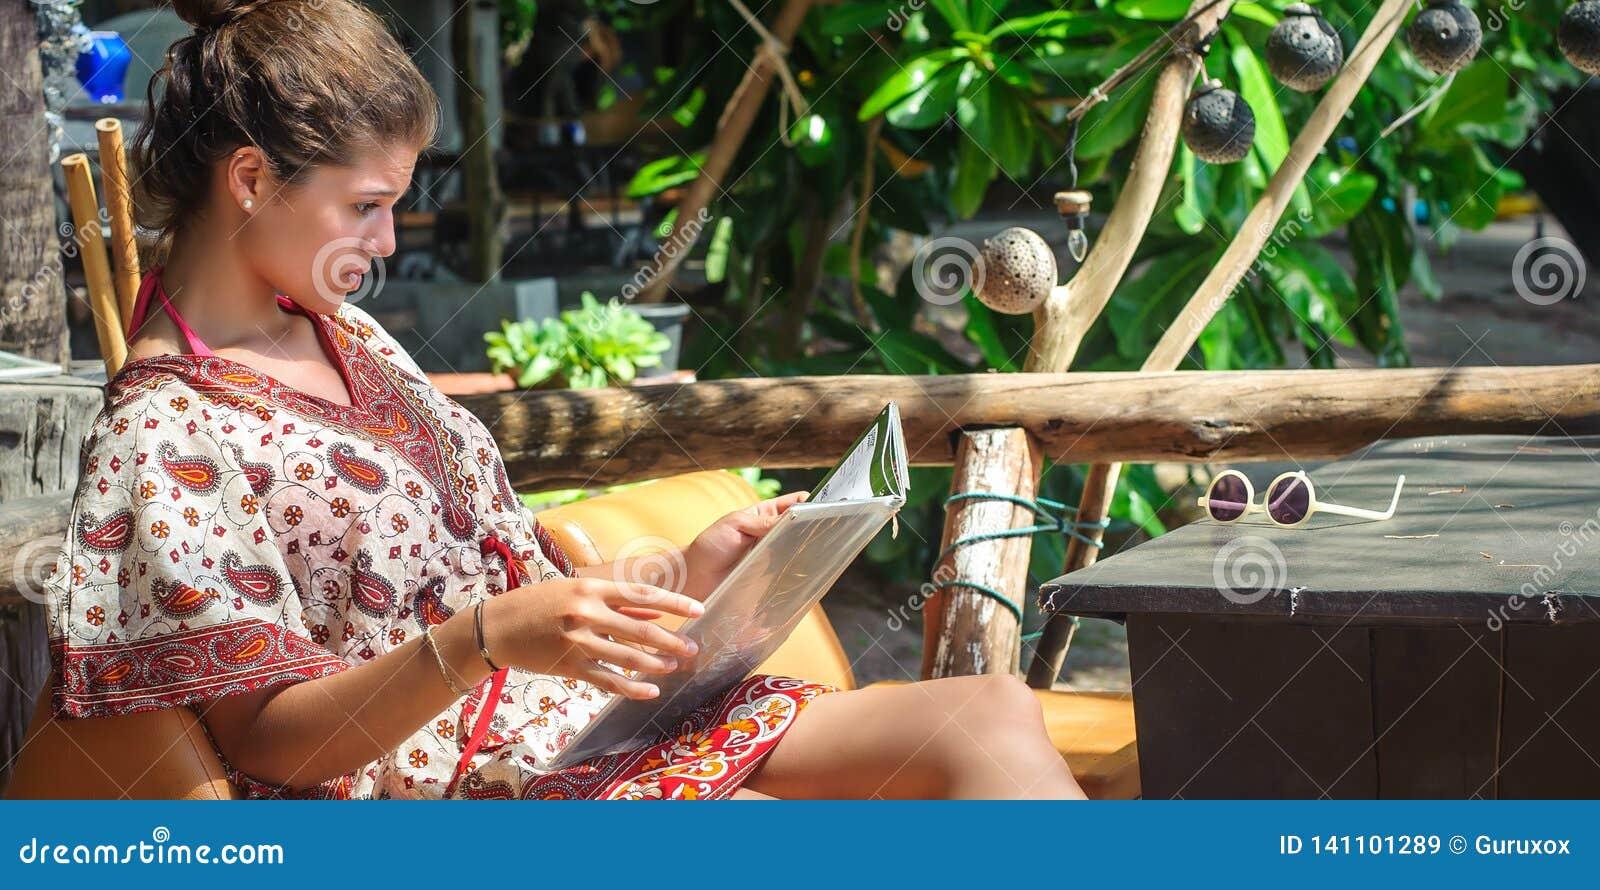 Young woman sitting in bamboo beach bar, looking at menu